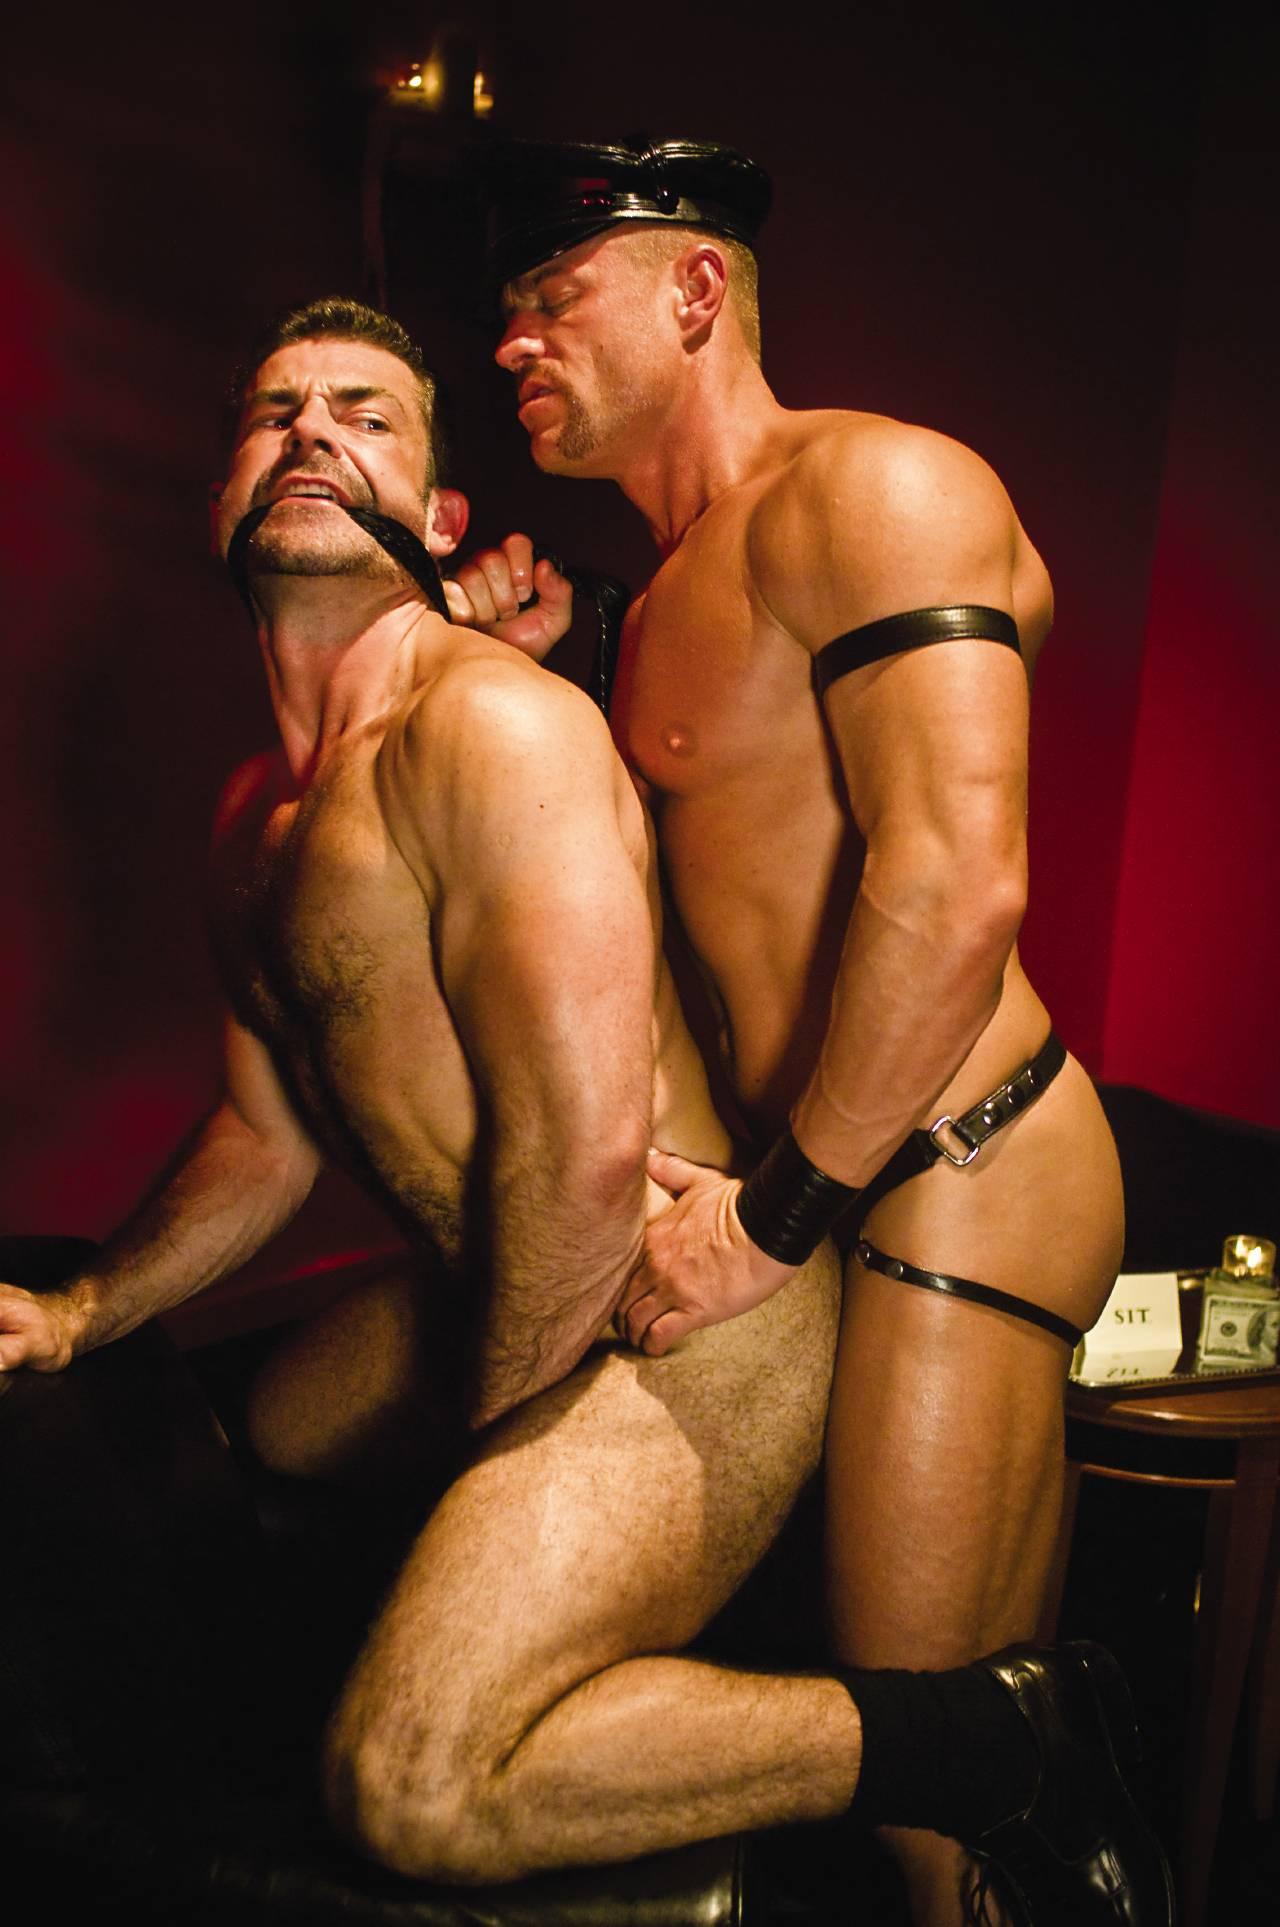 Gay Domination Videos